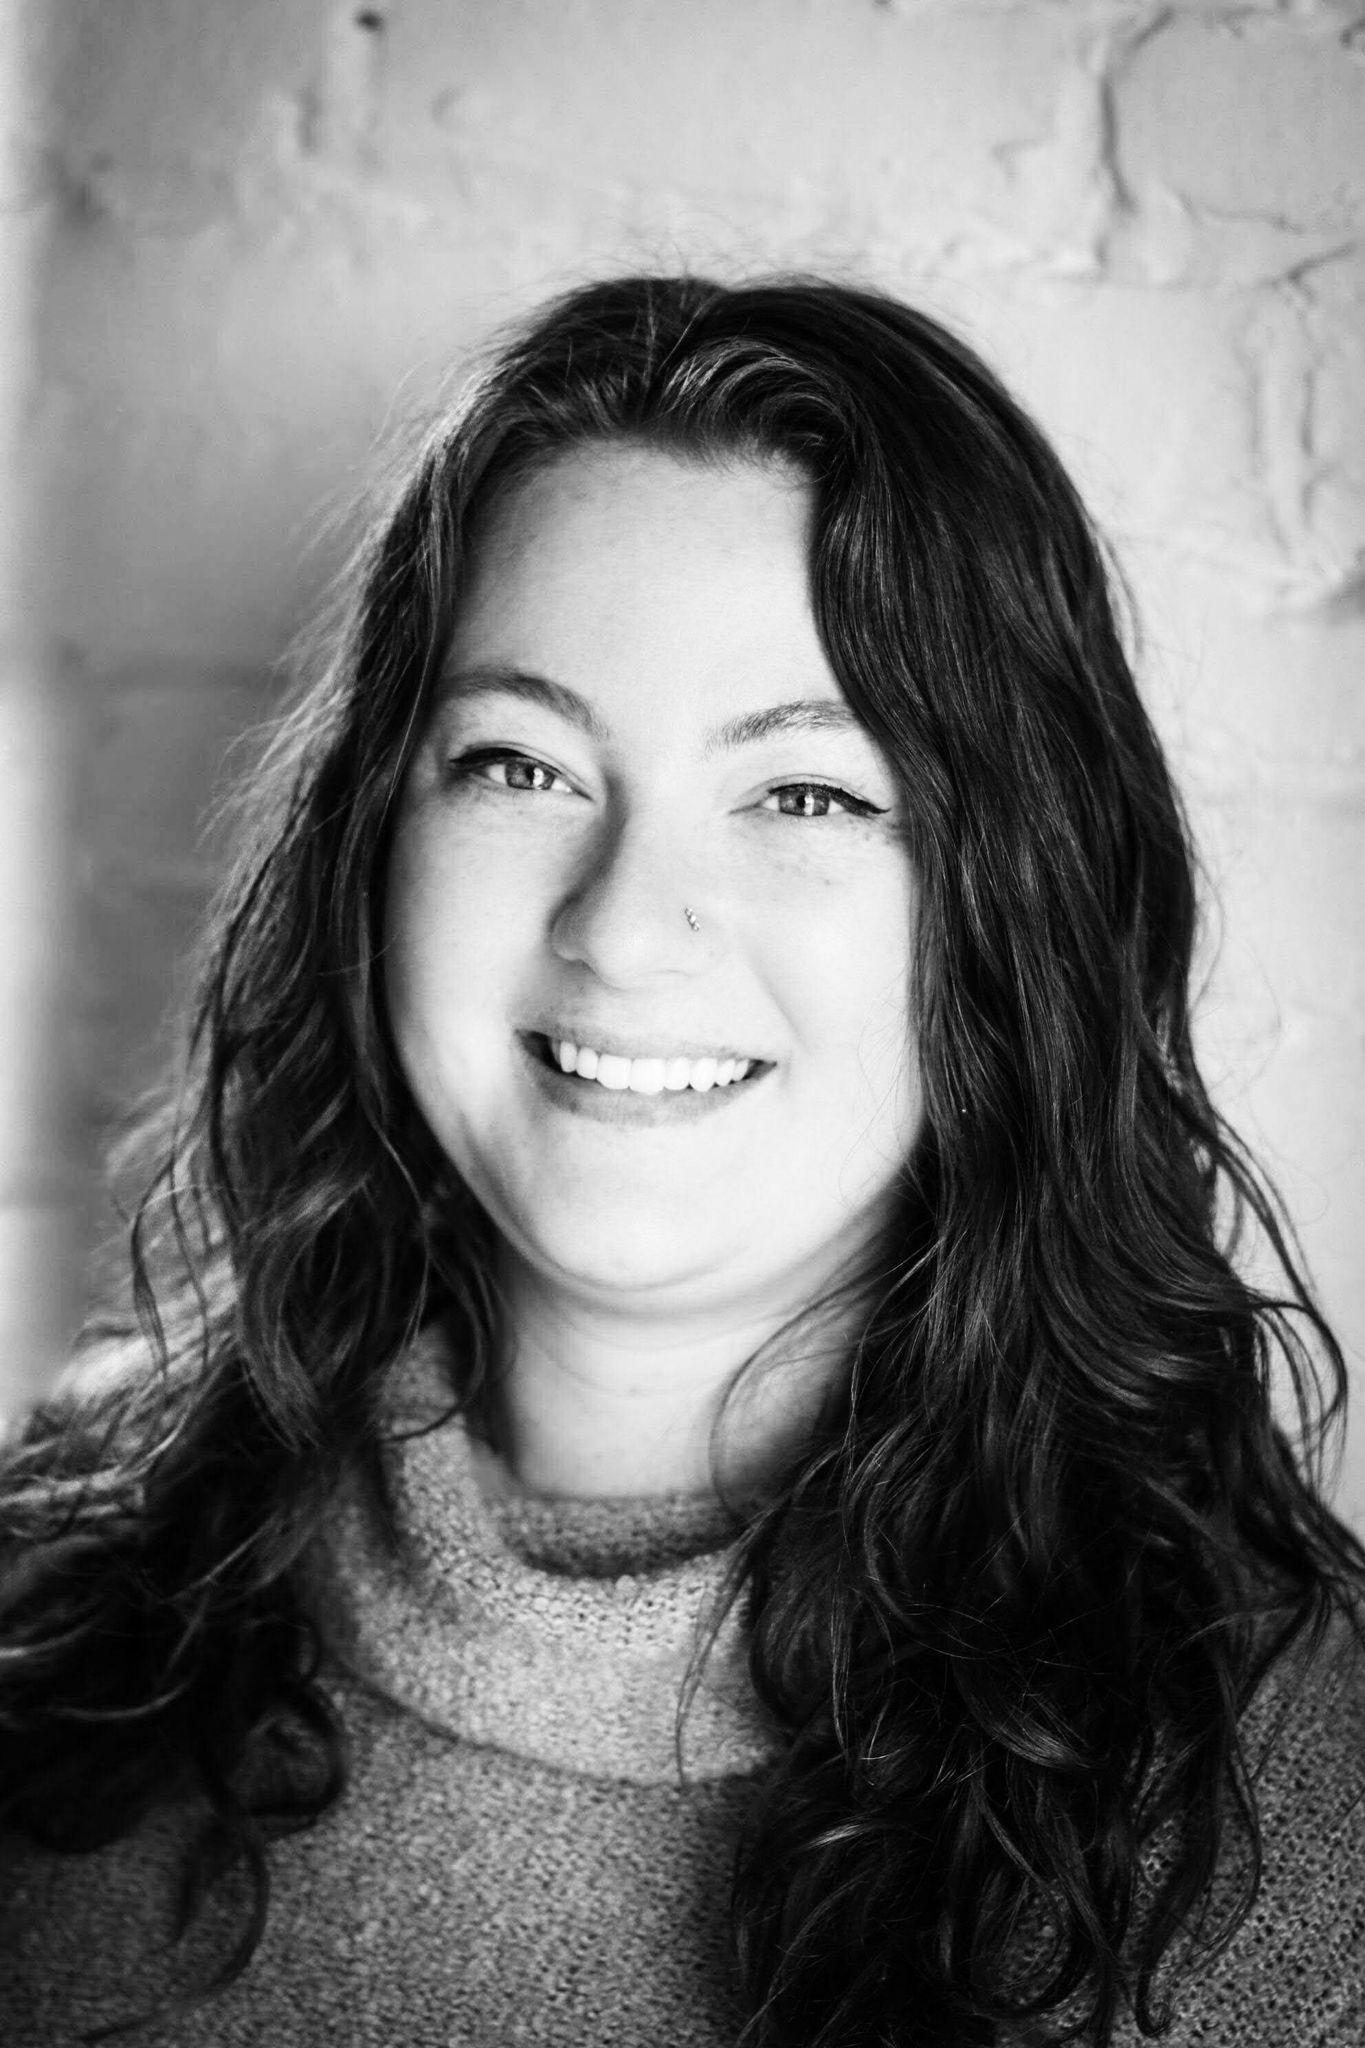 Beth Johnson - Director at Large